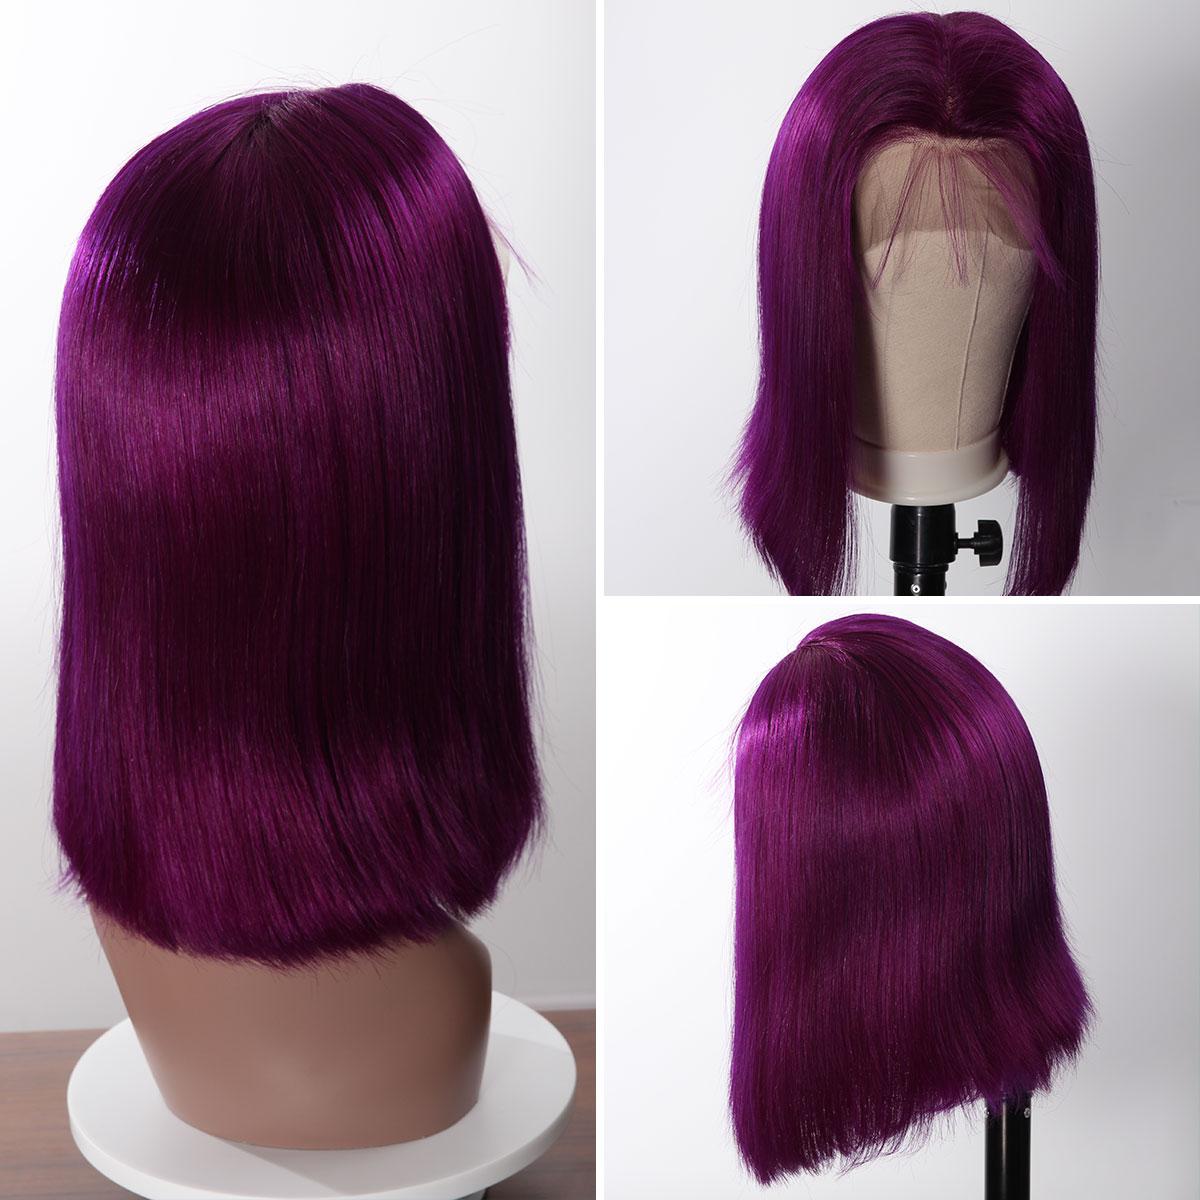 Colorful 13x6 Short Bob Straight Hair - Purple